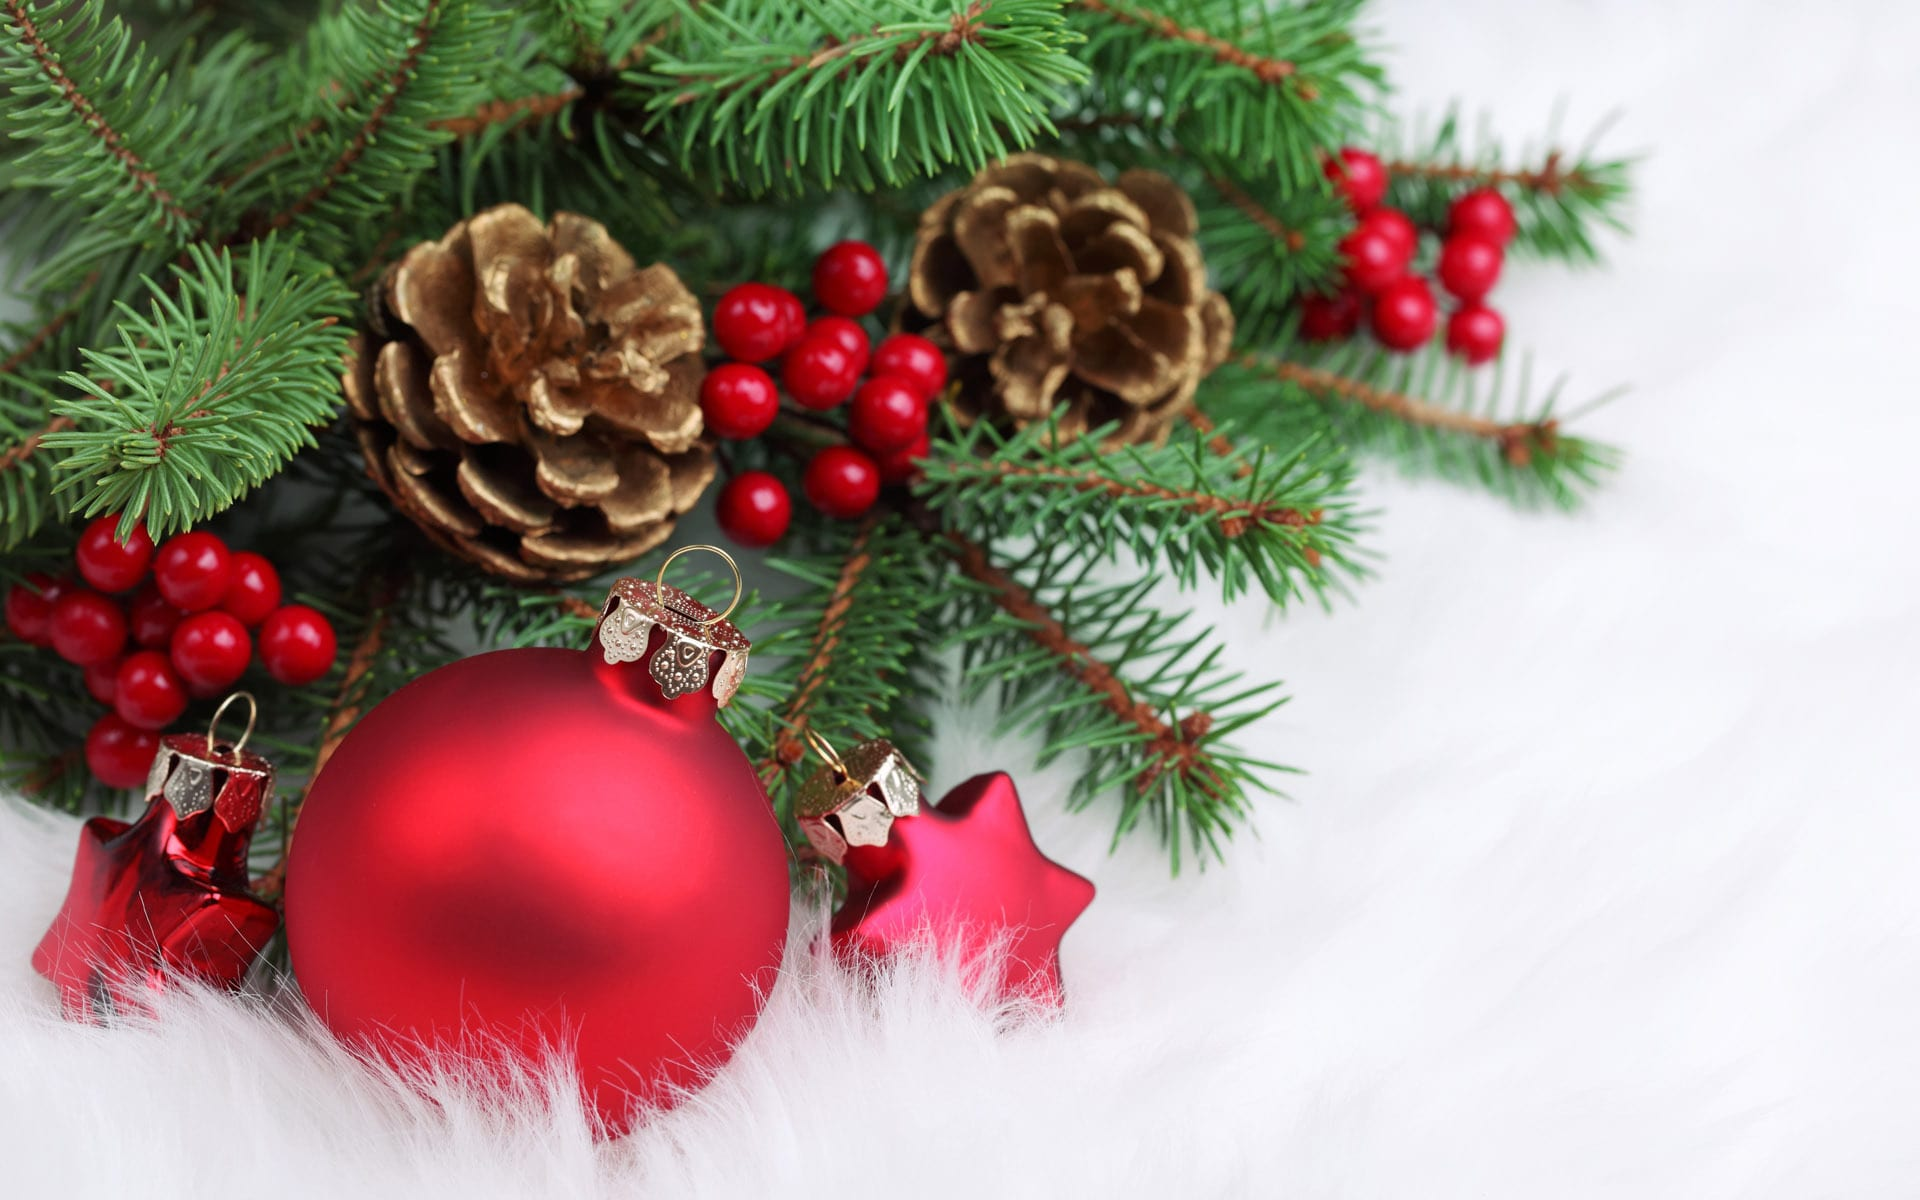 Red-Christmas-decorations-christmas-22228018-1920-1200